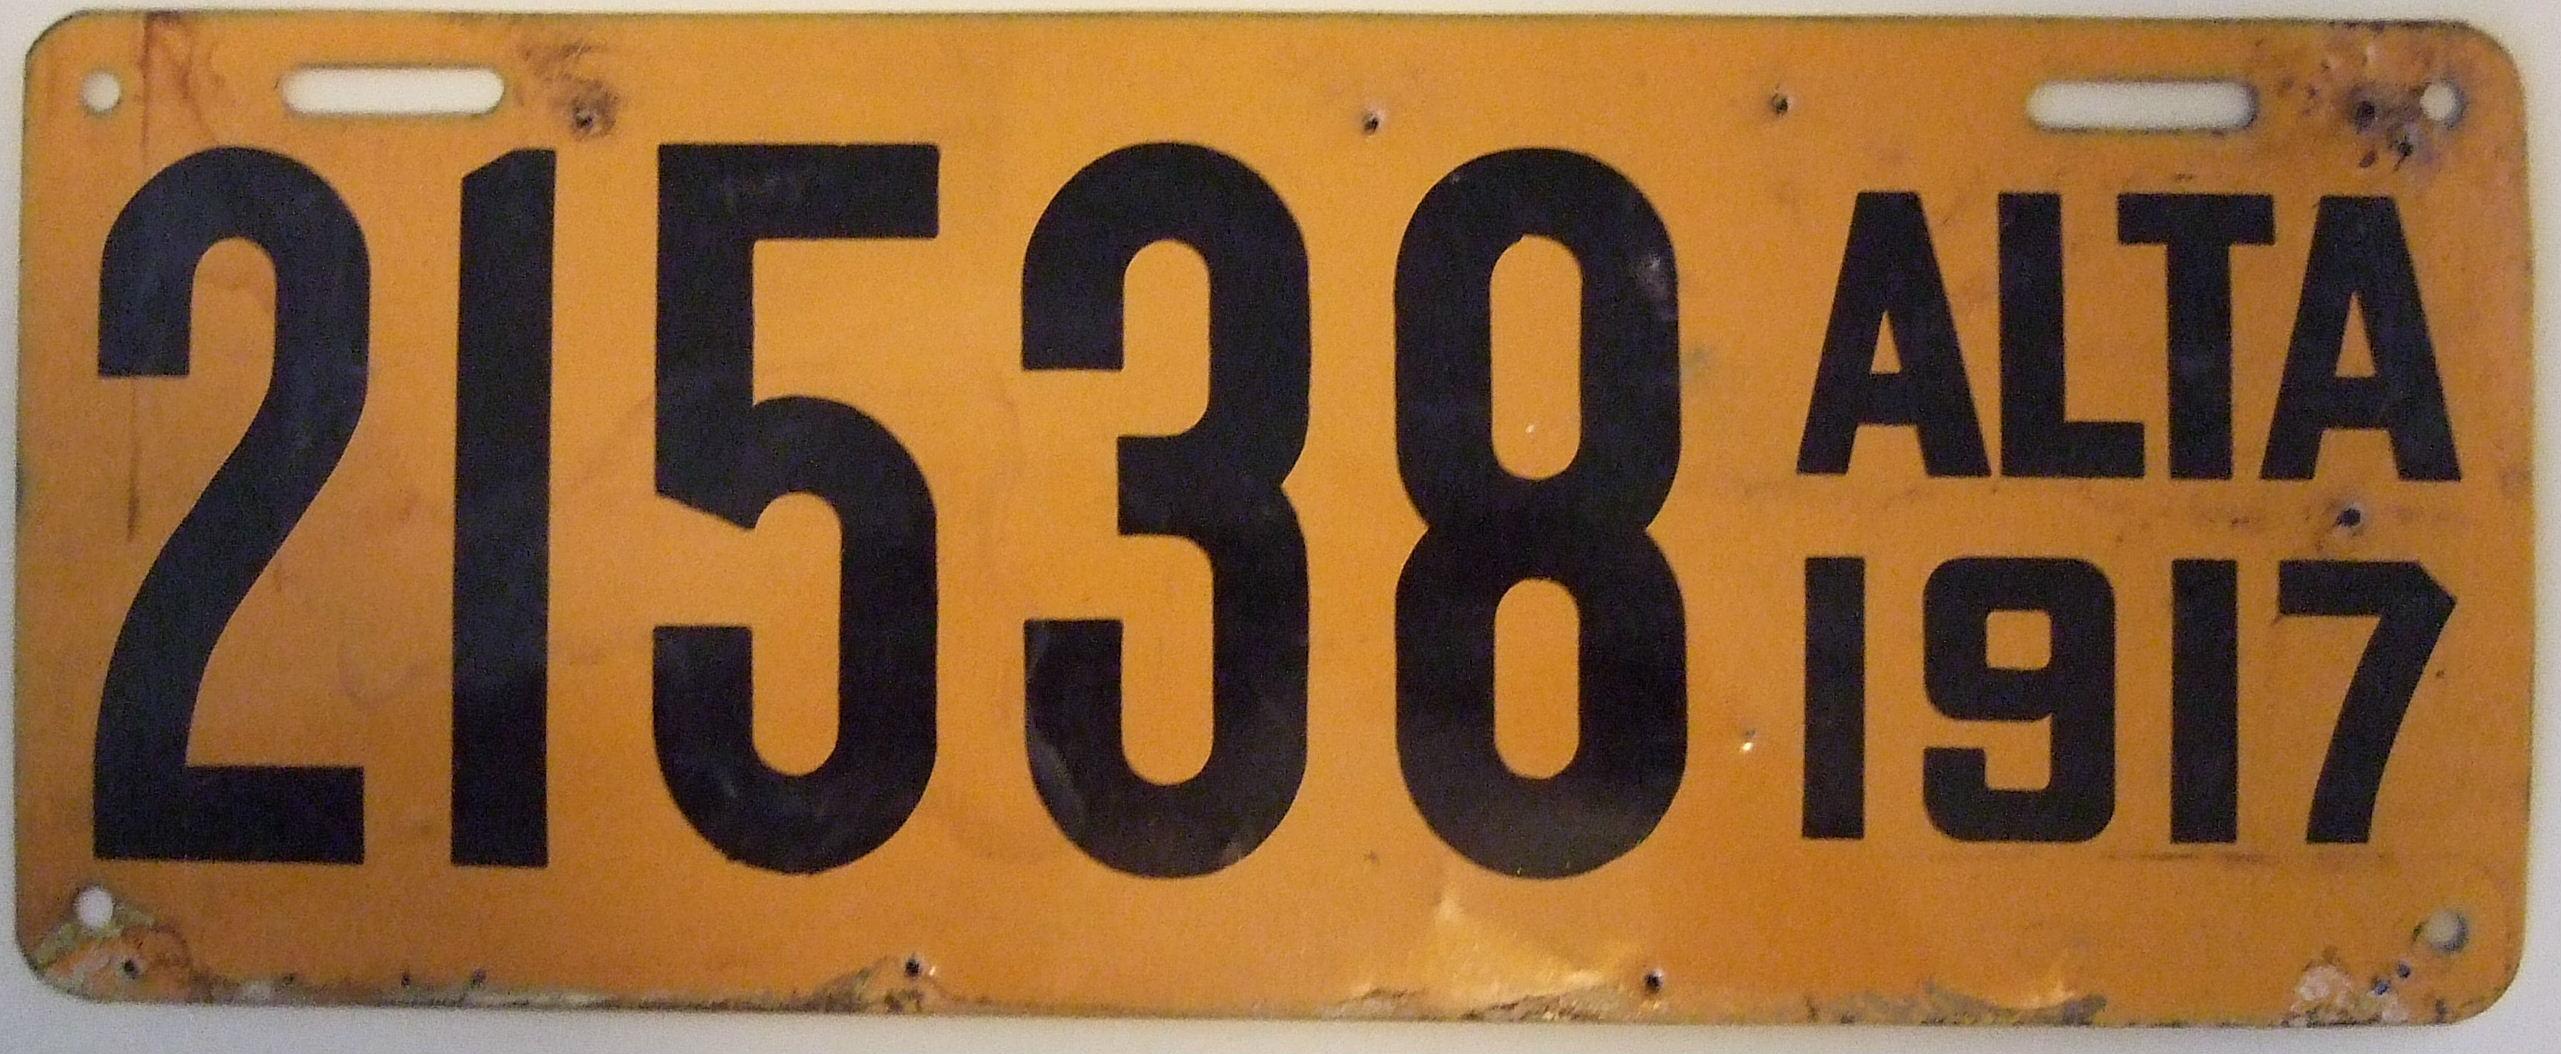 File:Alberta 1917 license plate - Number 21538.jpg - Wikimedia Commons